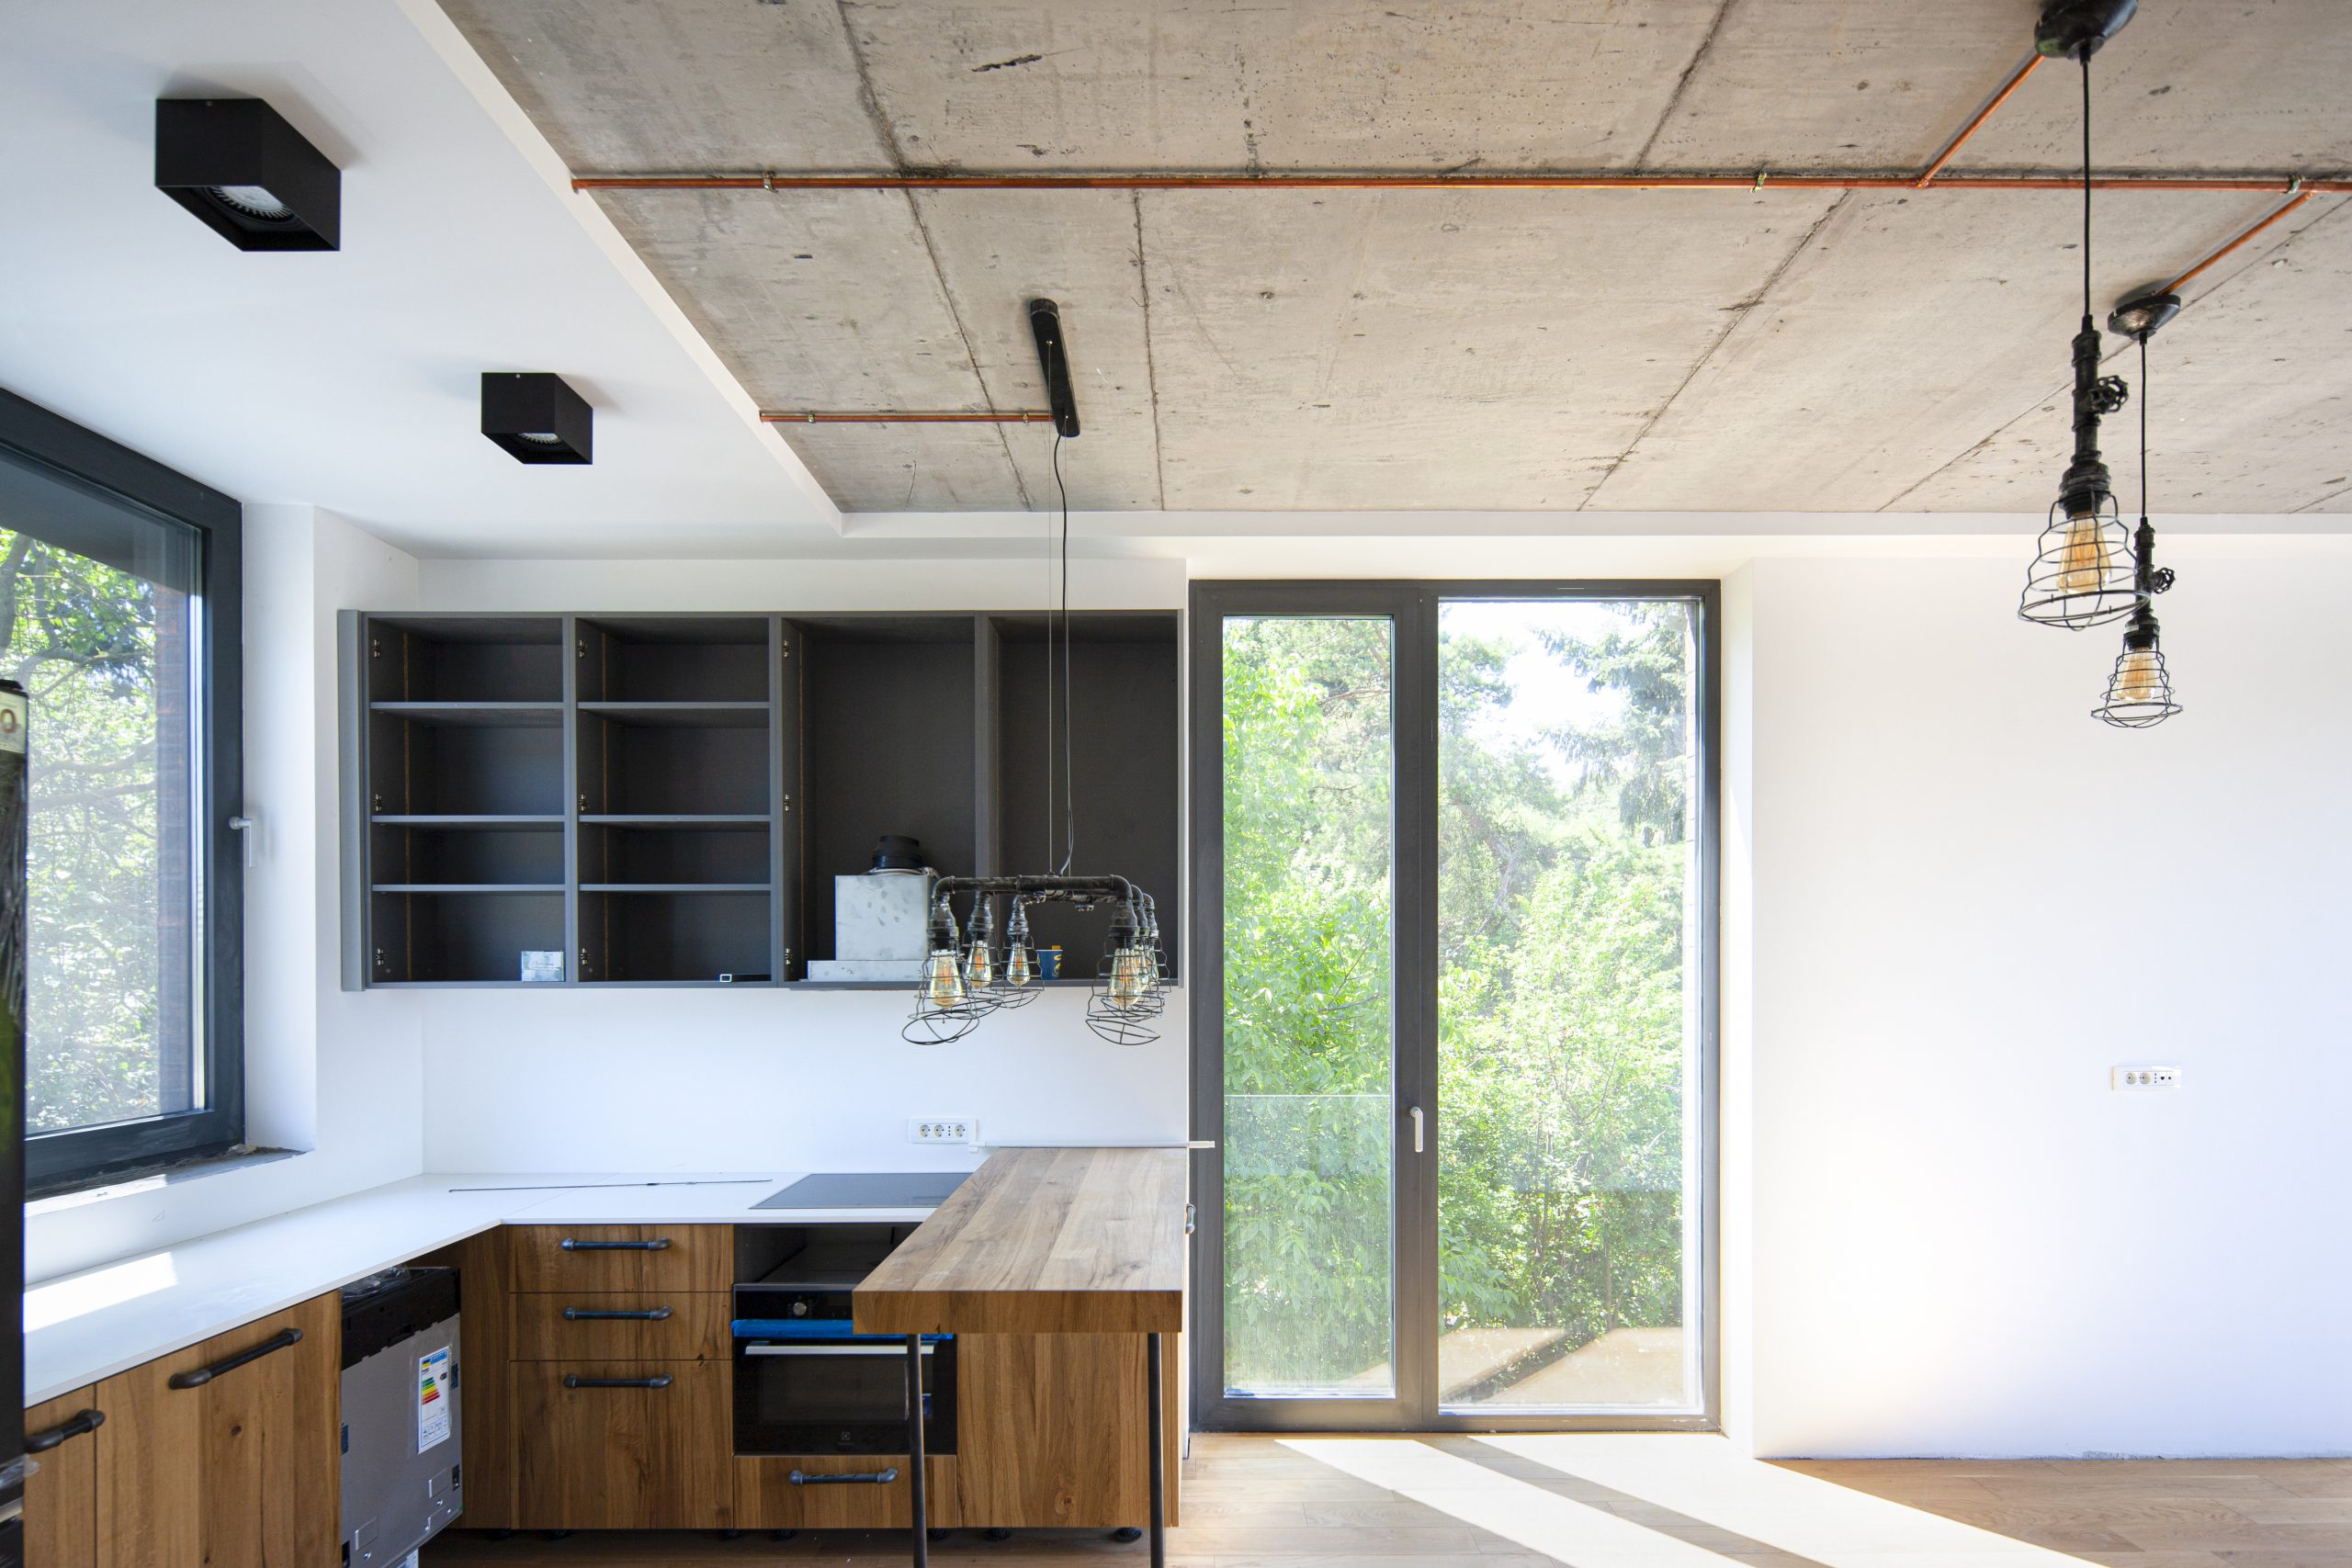 https://nbc-arhitect.ro/wp-content/uploads/2020/10/NBC-Arhitect-_-AD-Villa-_-Romania-_-interior-view_6-scaled.jpg